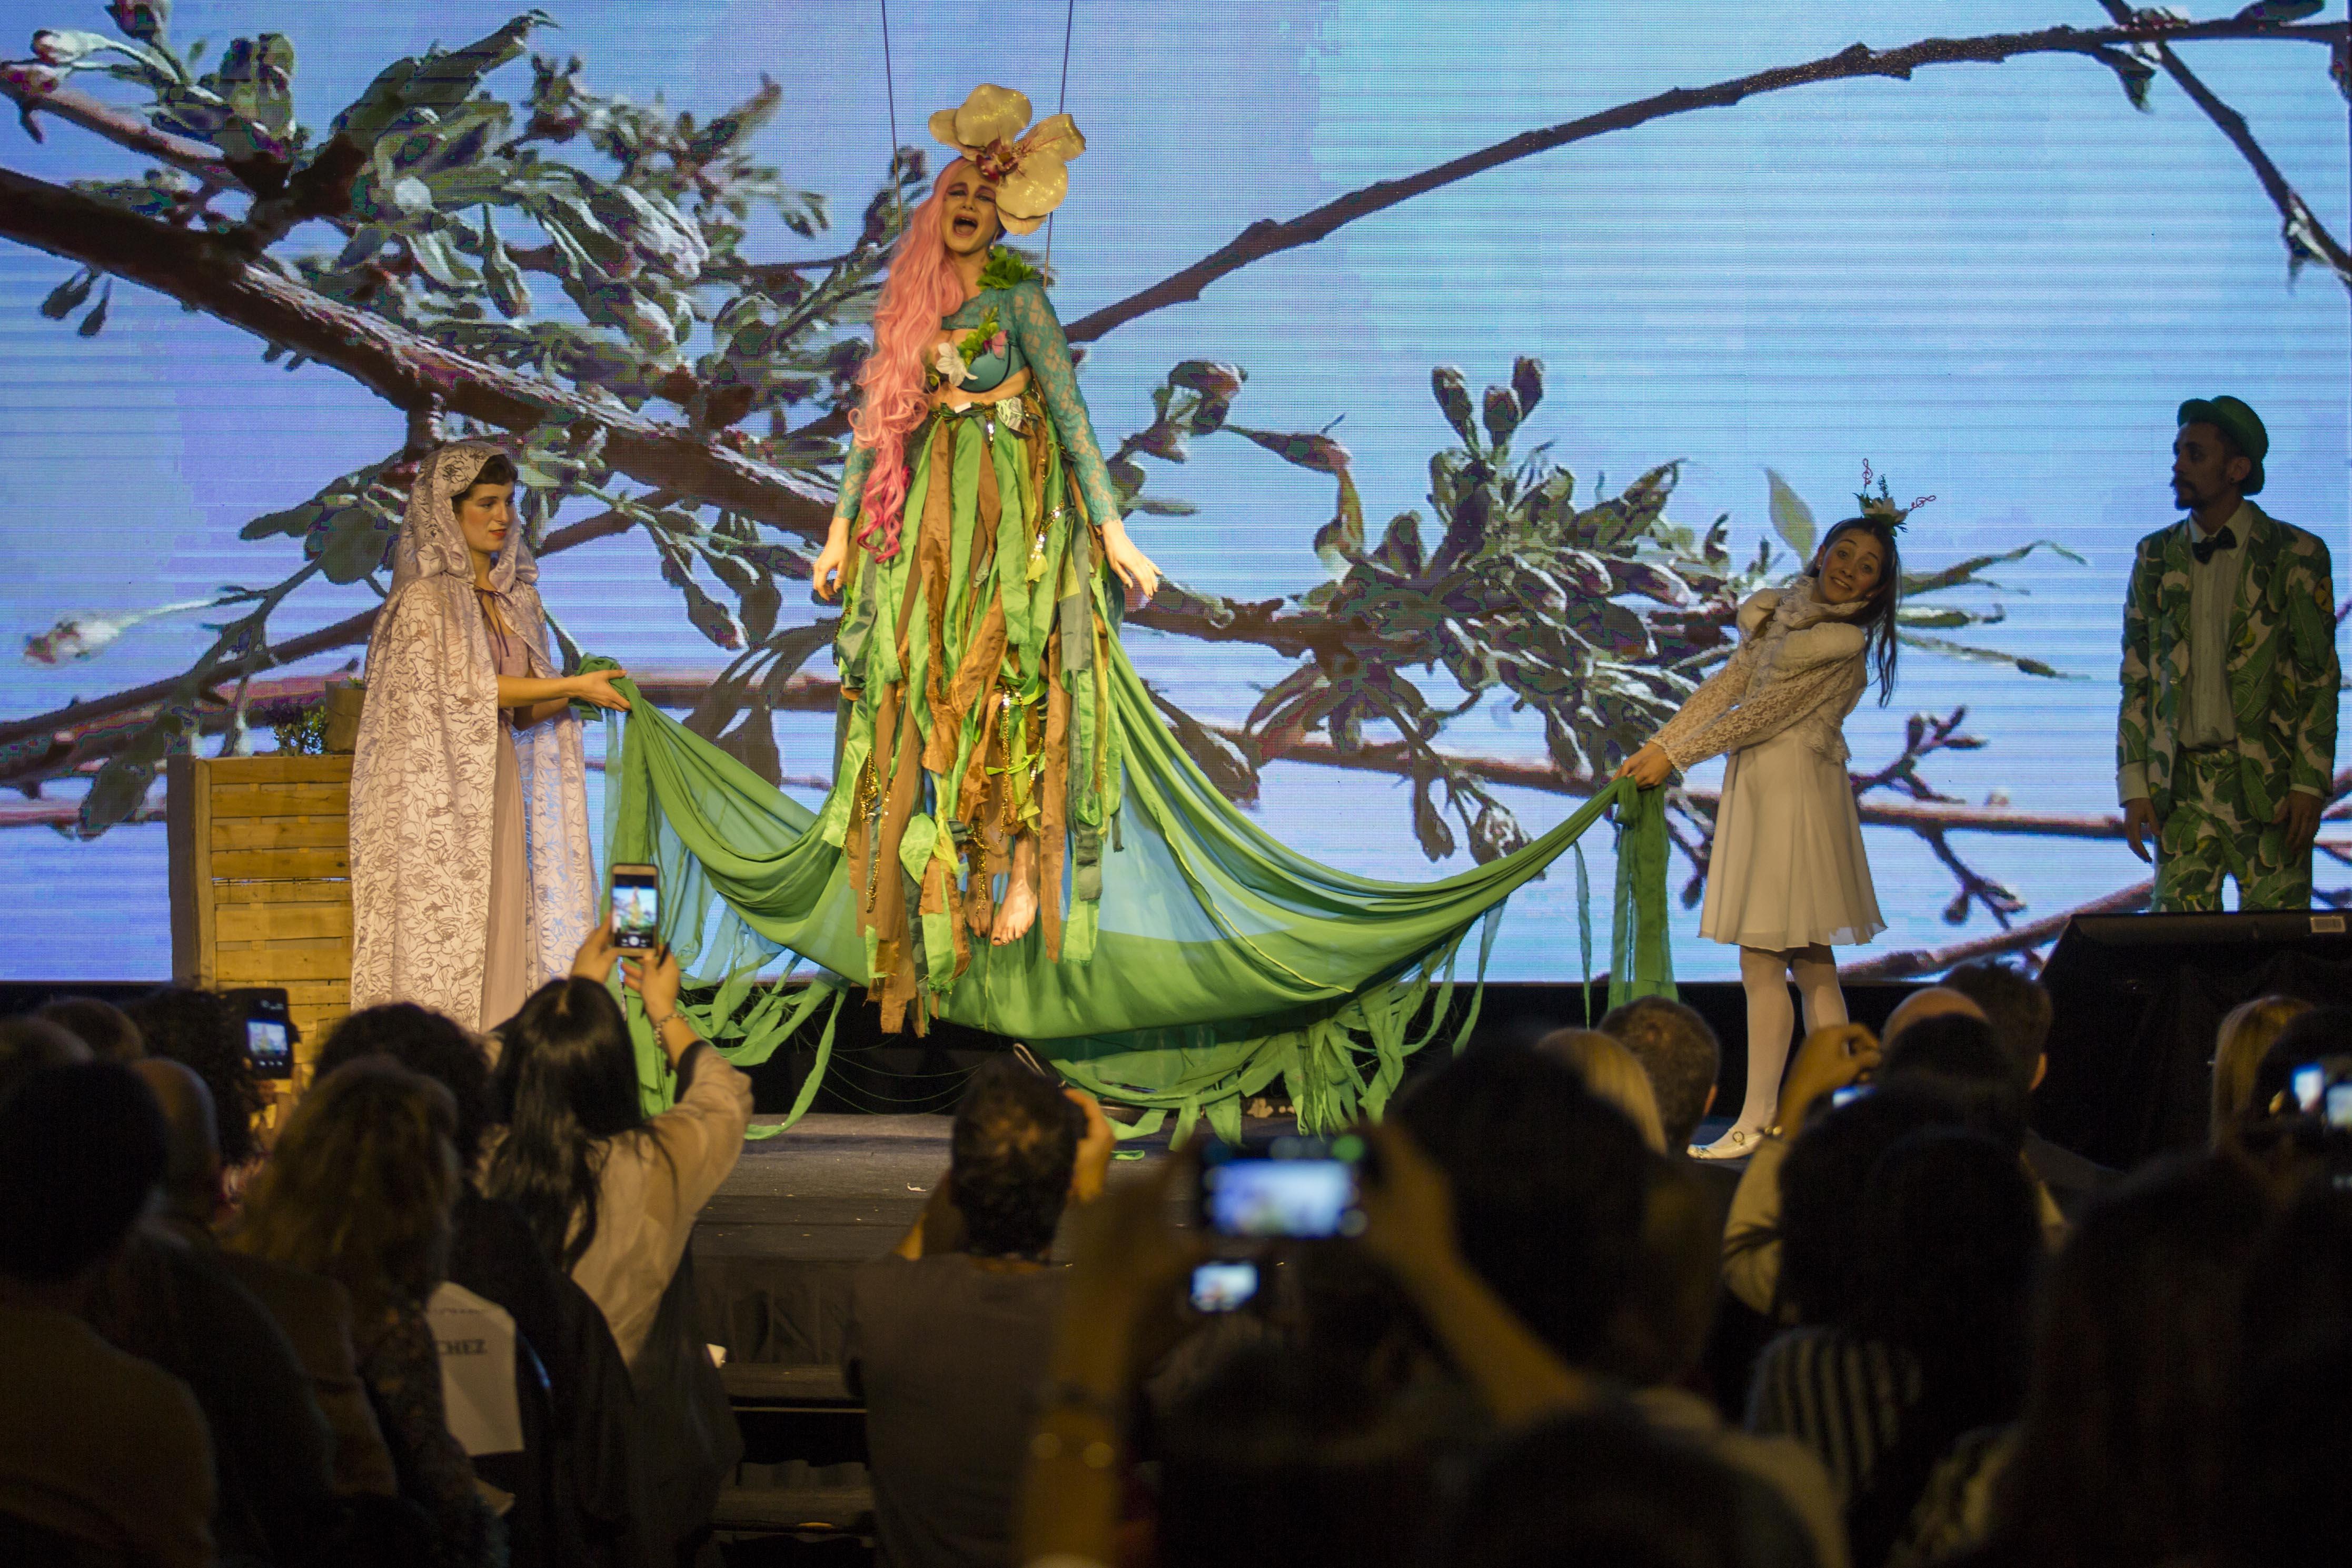 061 - show prismal biogreen - _MAT4300 - Matias Salgado